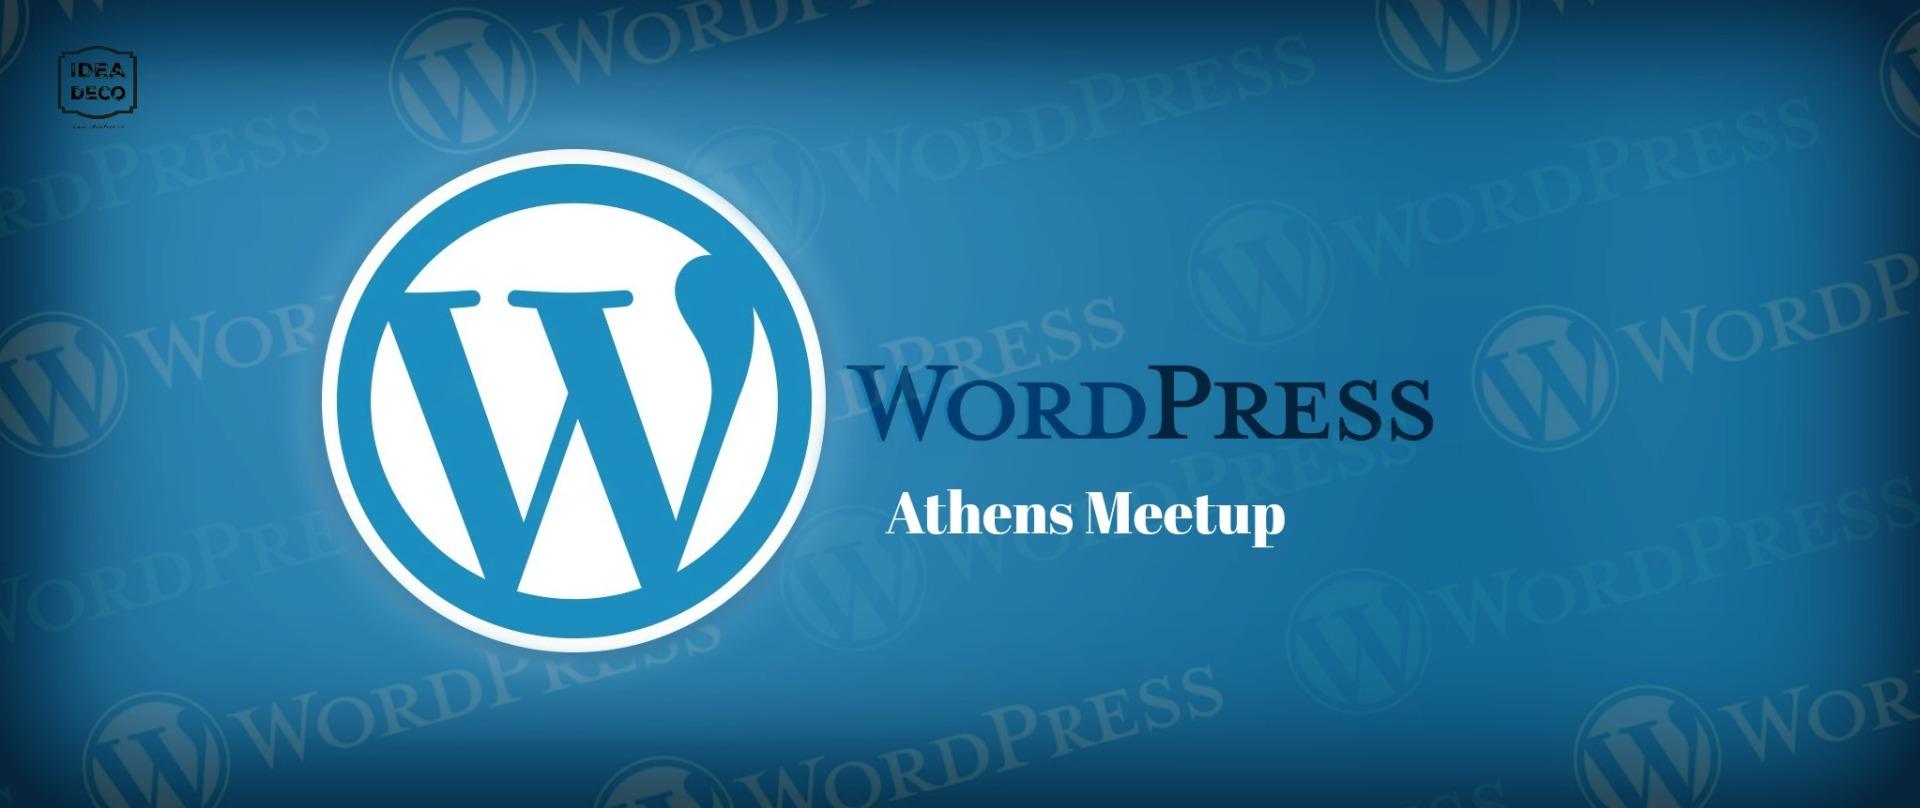 Athens 10th WordPress Meetup